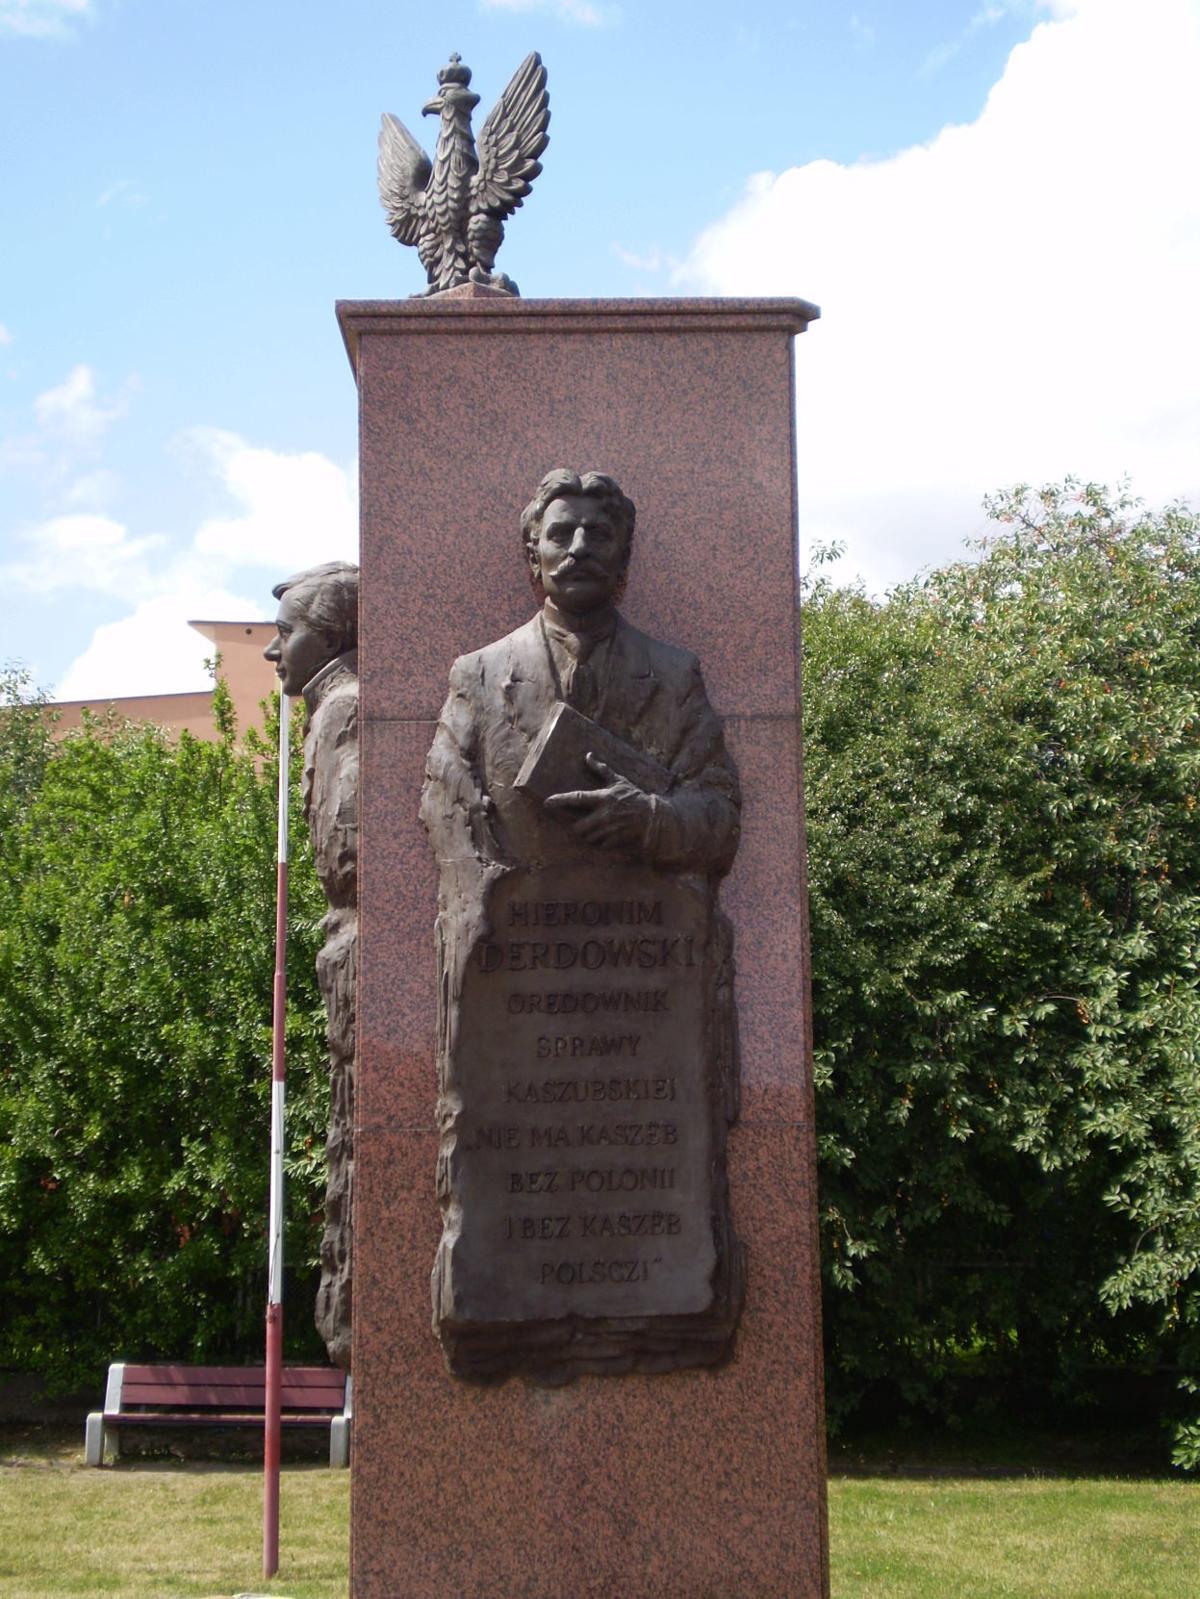 Monument to a Winonan